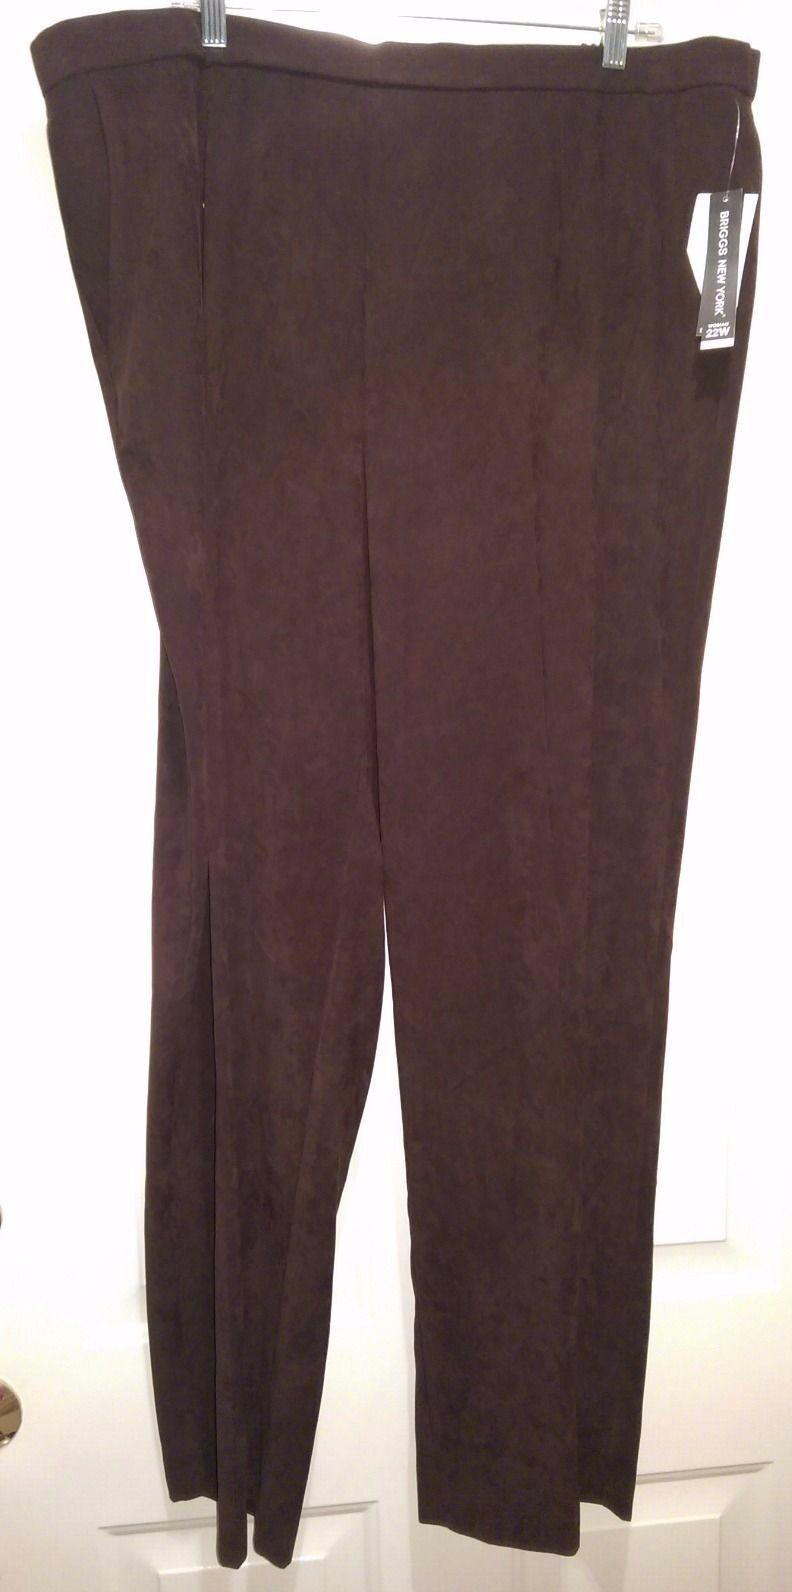 Briggs New York NWT damen braun Pants Größe 22W